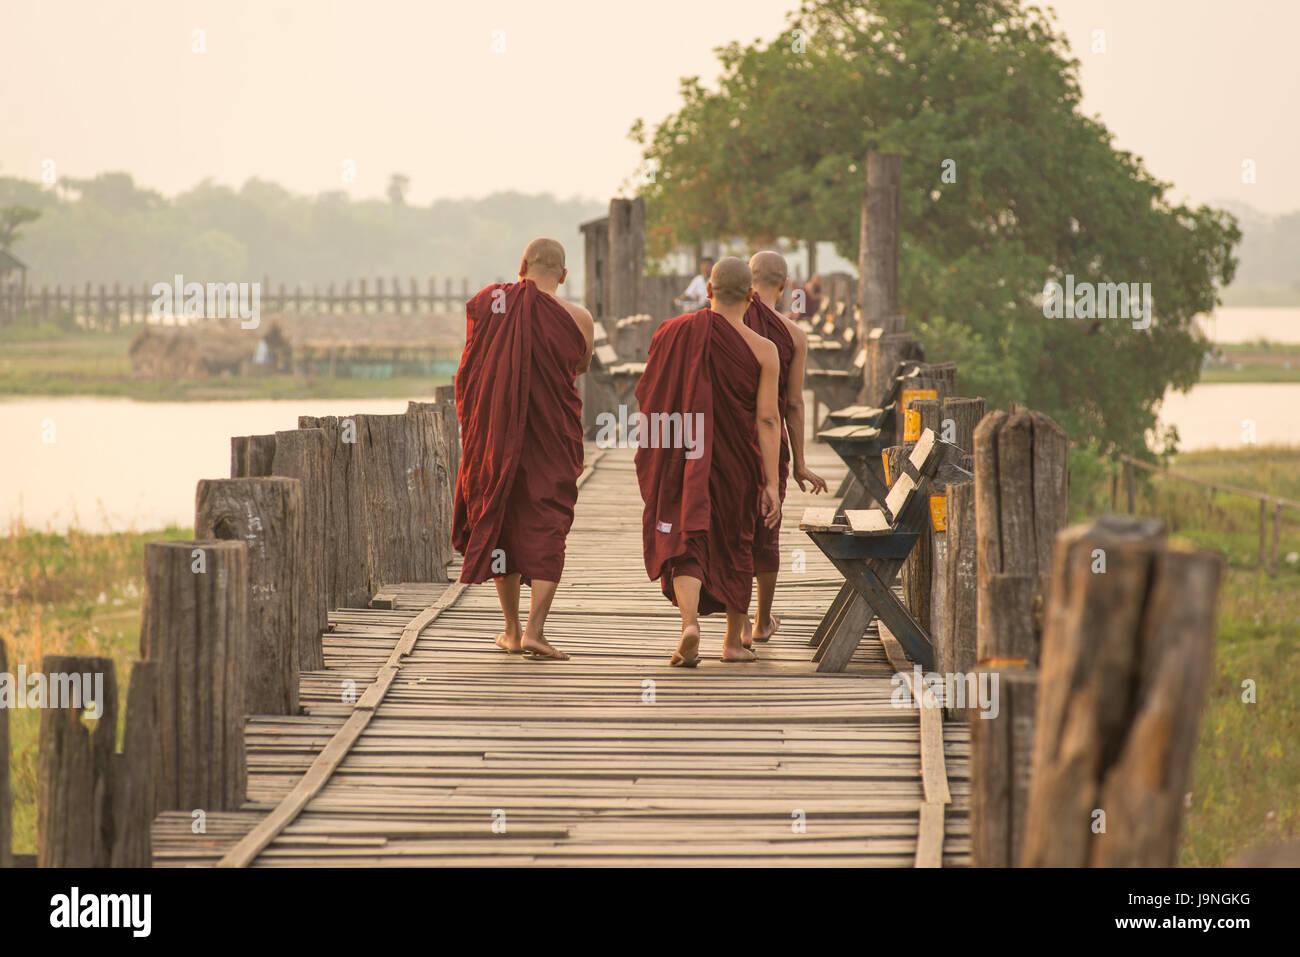 Monks waking at sunrise over U Bein Teak Bridge, Amarapura, Myanmar. - Stock Image